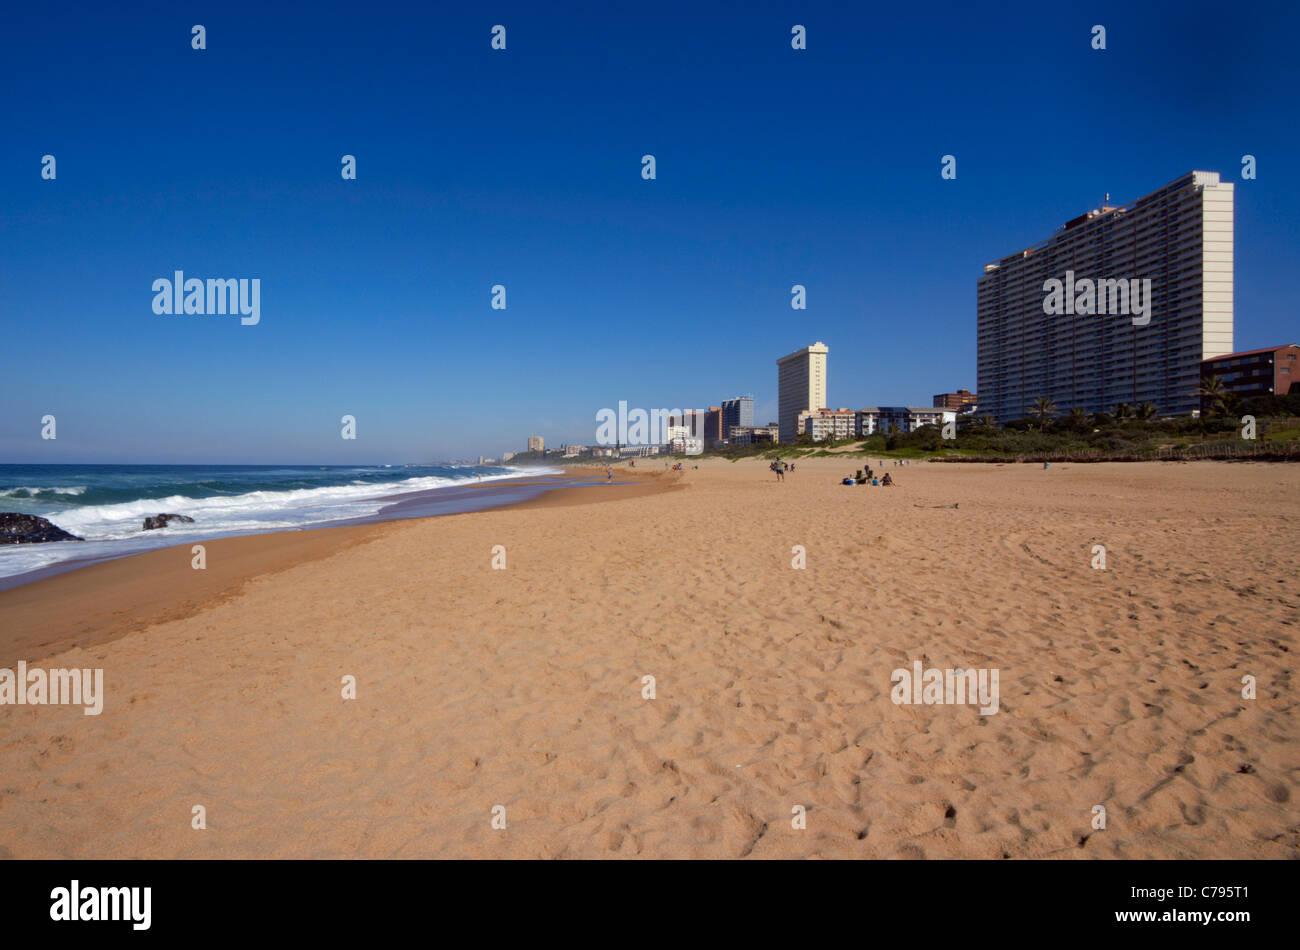 Beach at Amanzimtoti, KwaZulu-Natal, South Africa. Stock Photo